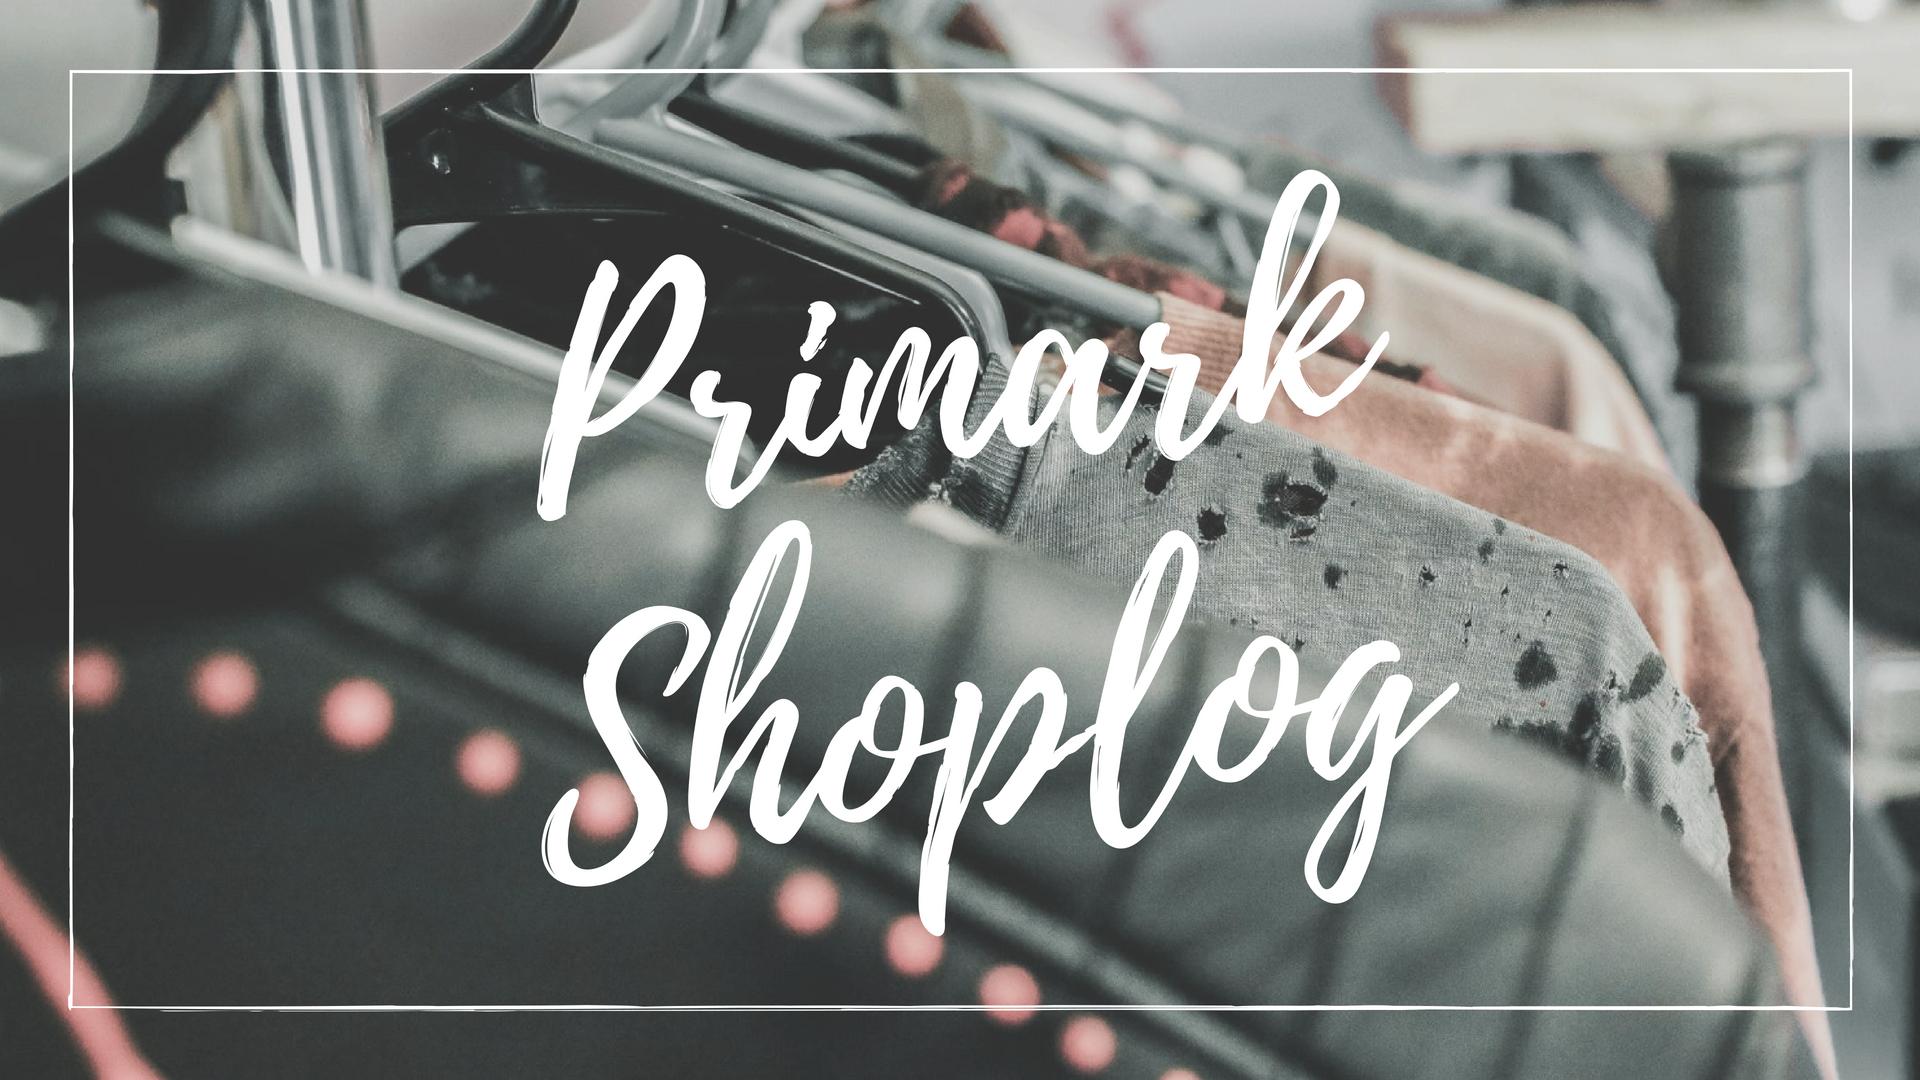 primark shoplog mei 2018